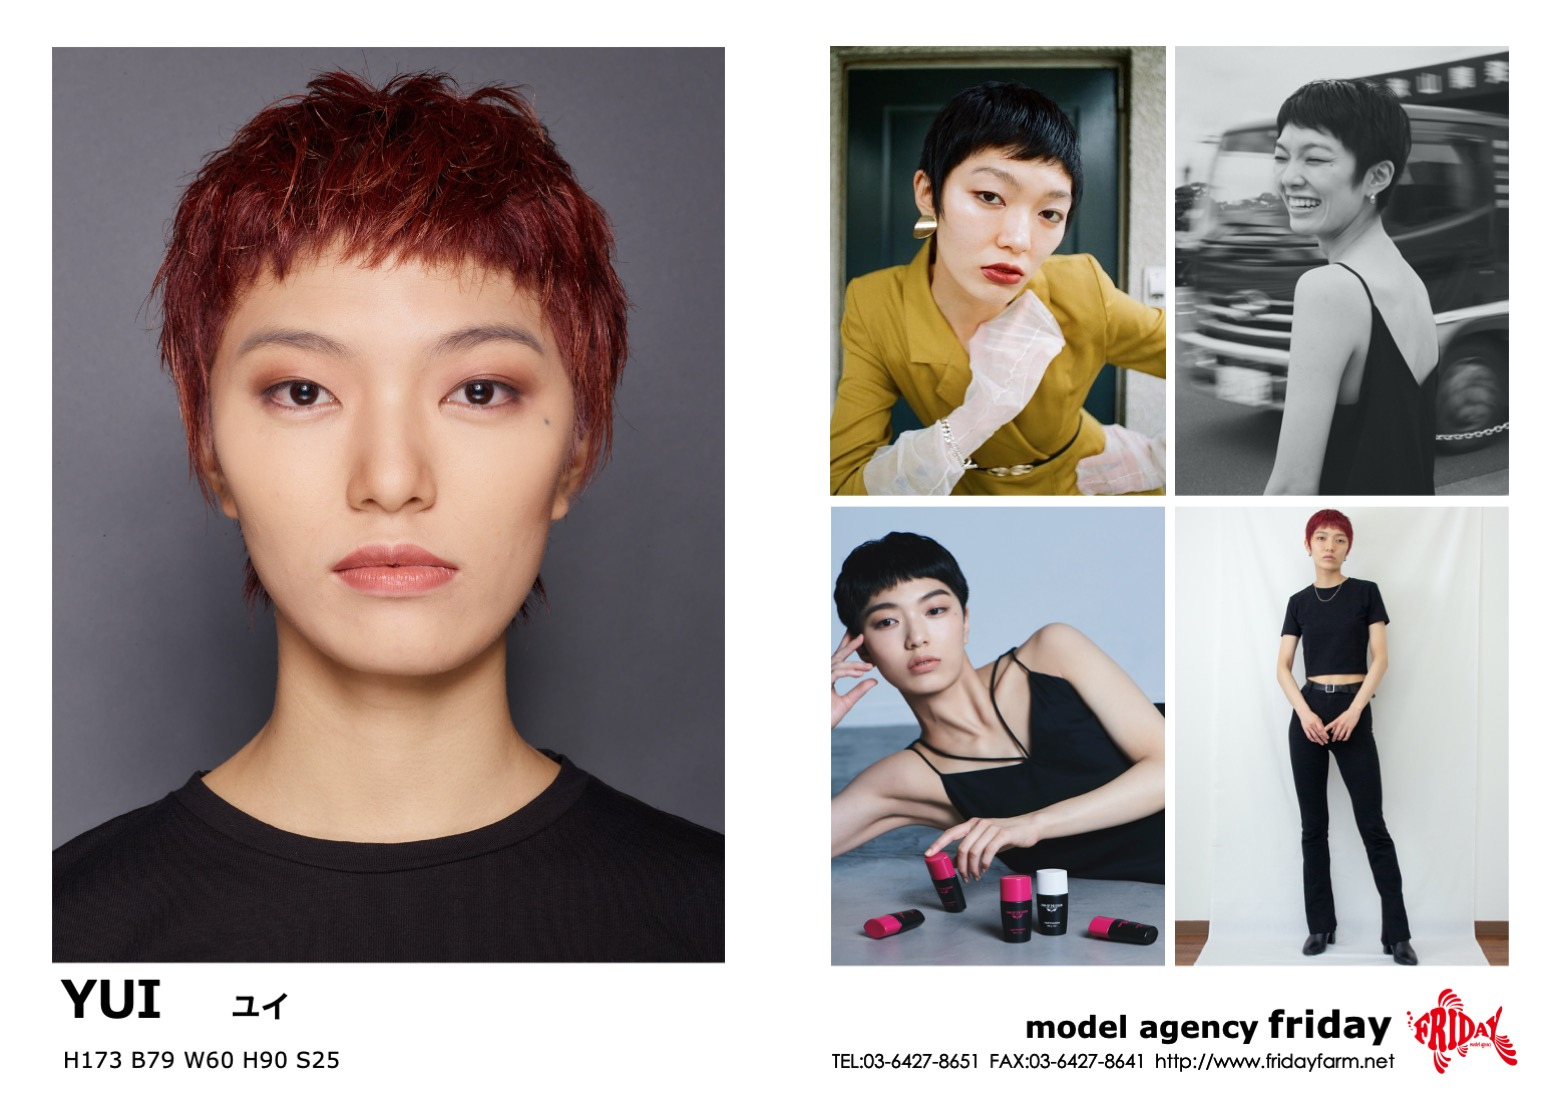 YUI - ユイ | model agency friday